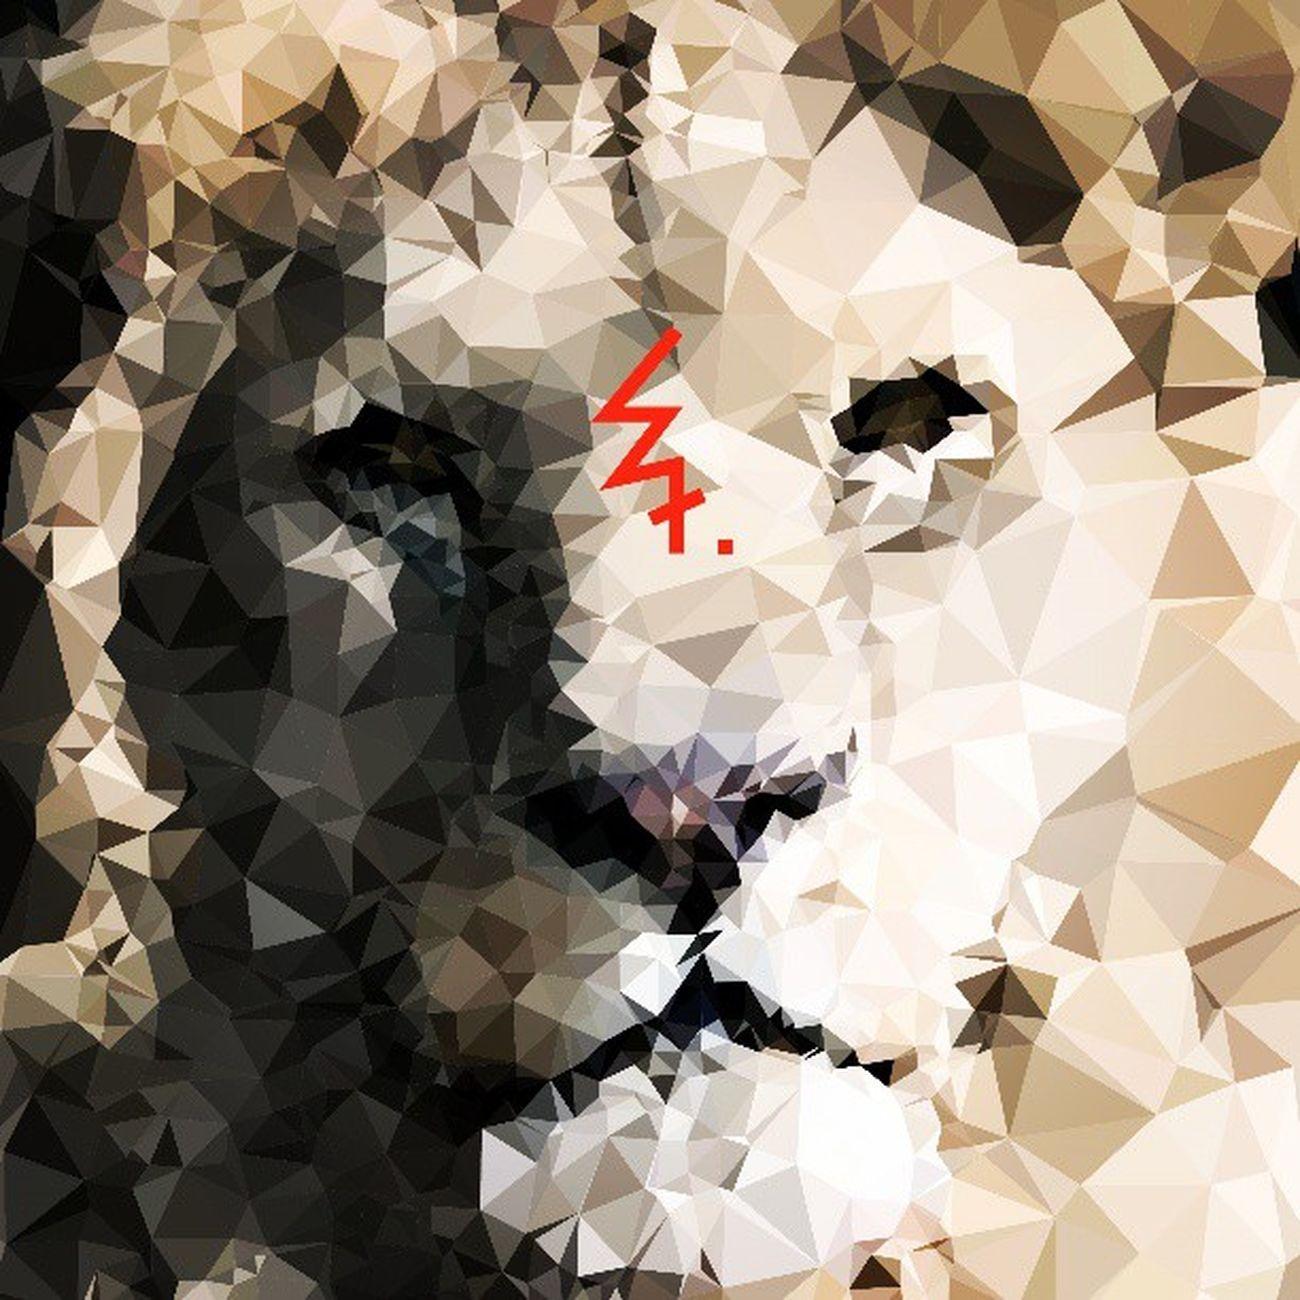 Leo Leo Lion Graphicdesiner Graphic Graphicdesign Geometric Geometry Illustrator Illustration Illustrate Art Communication SSRU Suansunandha Thaigraphic Iamthaigraphicdesigner Instaphoto Insta_thailand Thaistagram Adayinthailand Bangkok Seeyoutomorrow